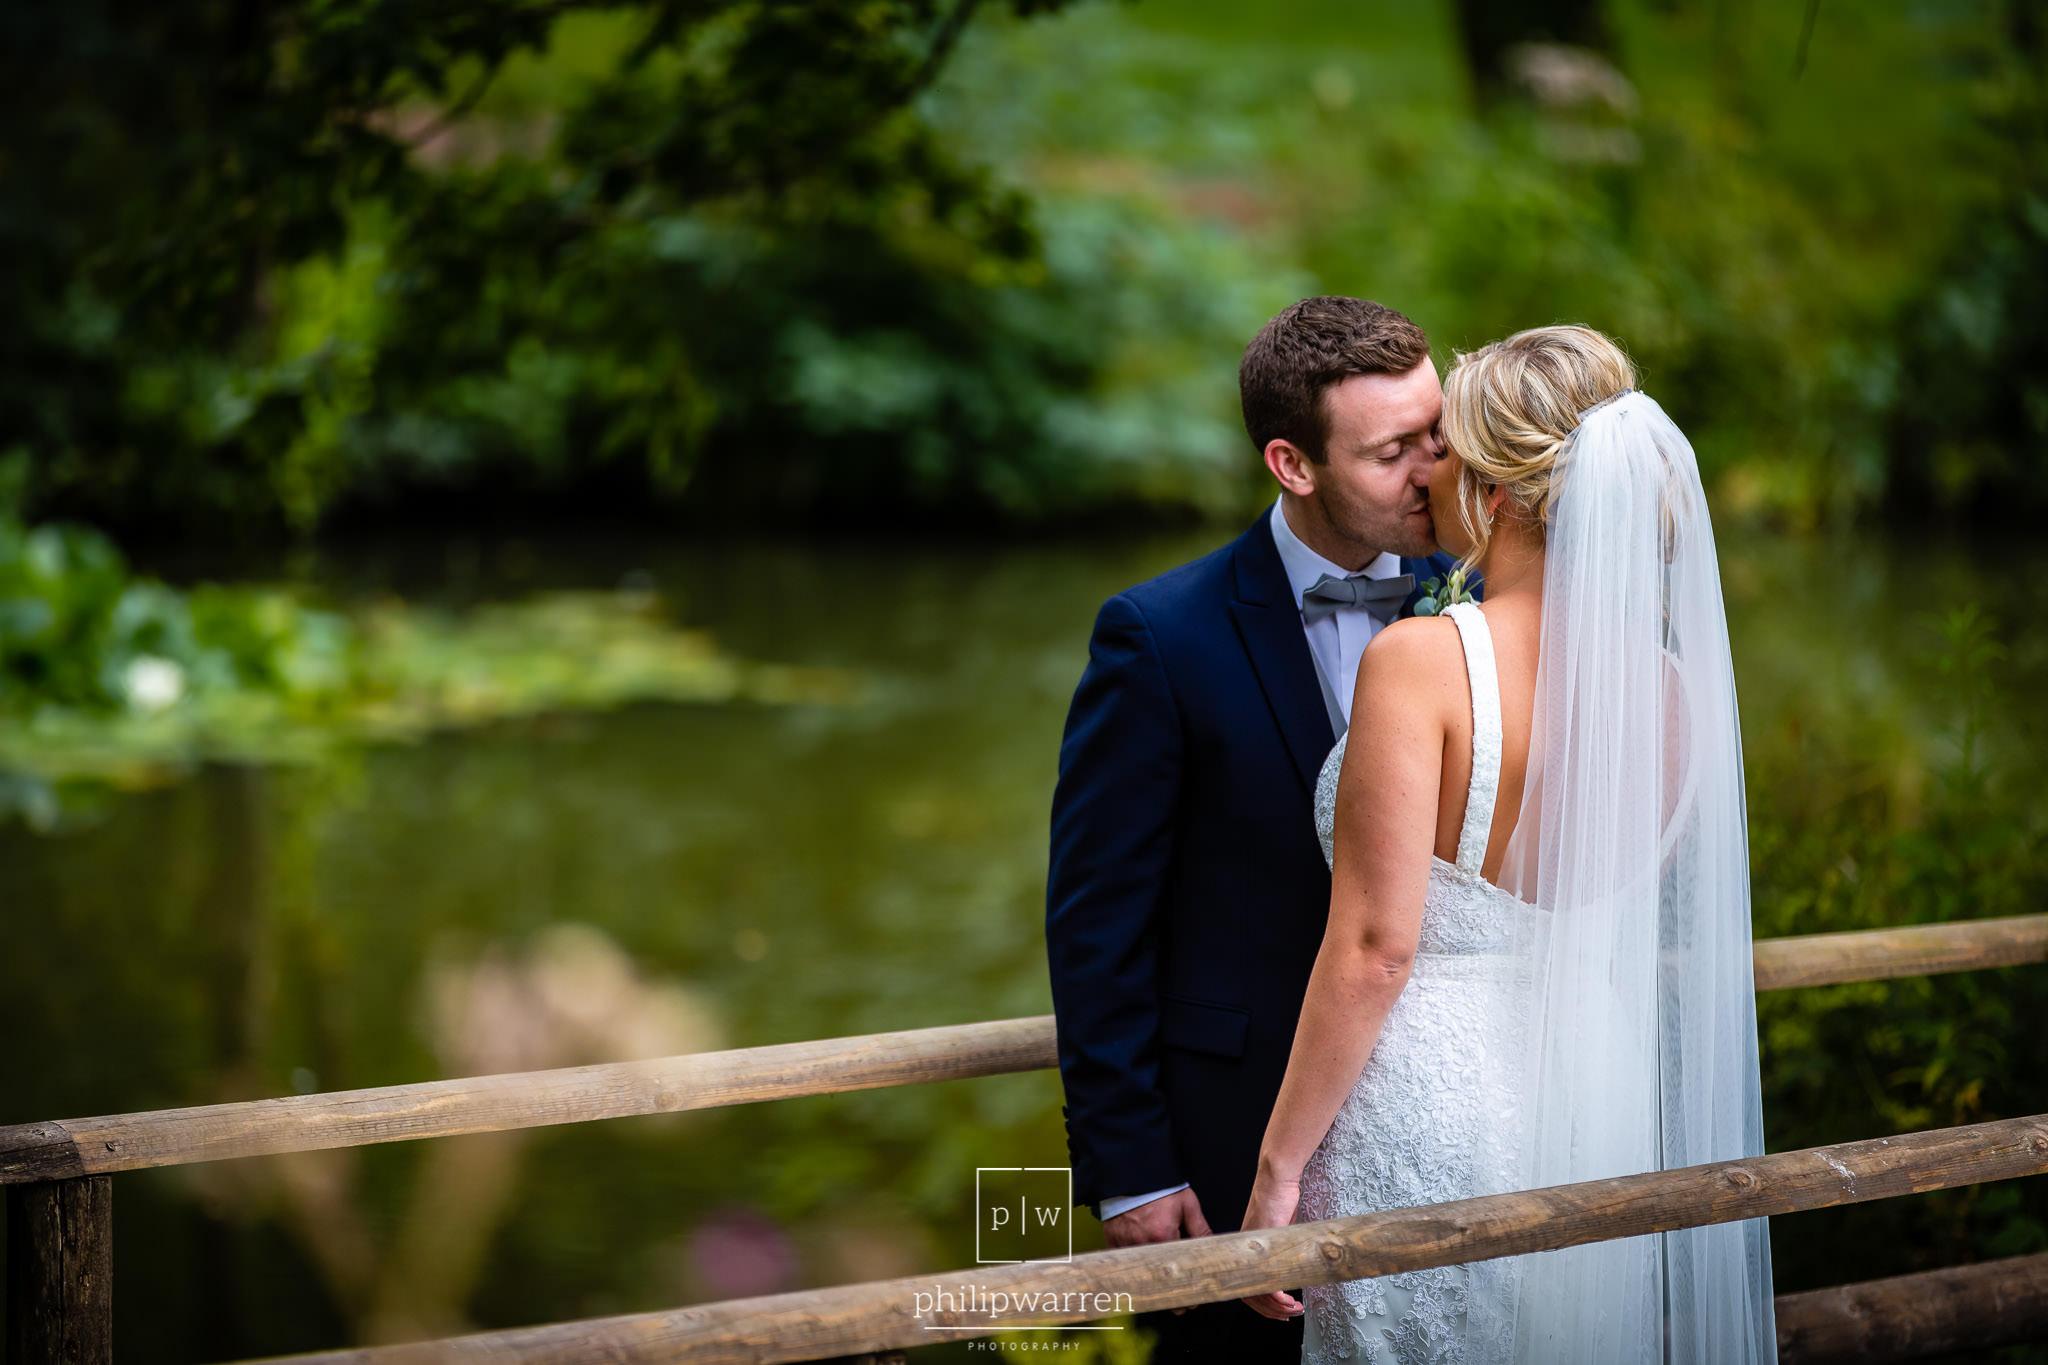 wedding photos at llanerch vineyard rachel + craig-9.jpg